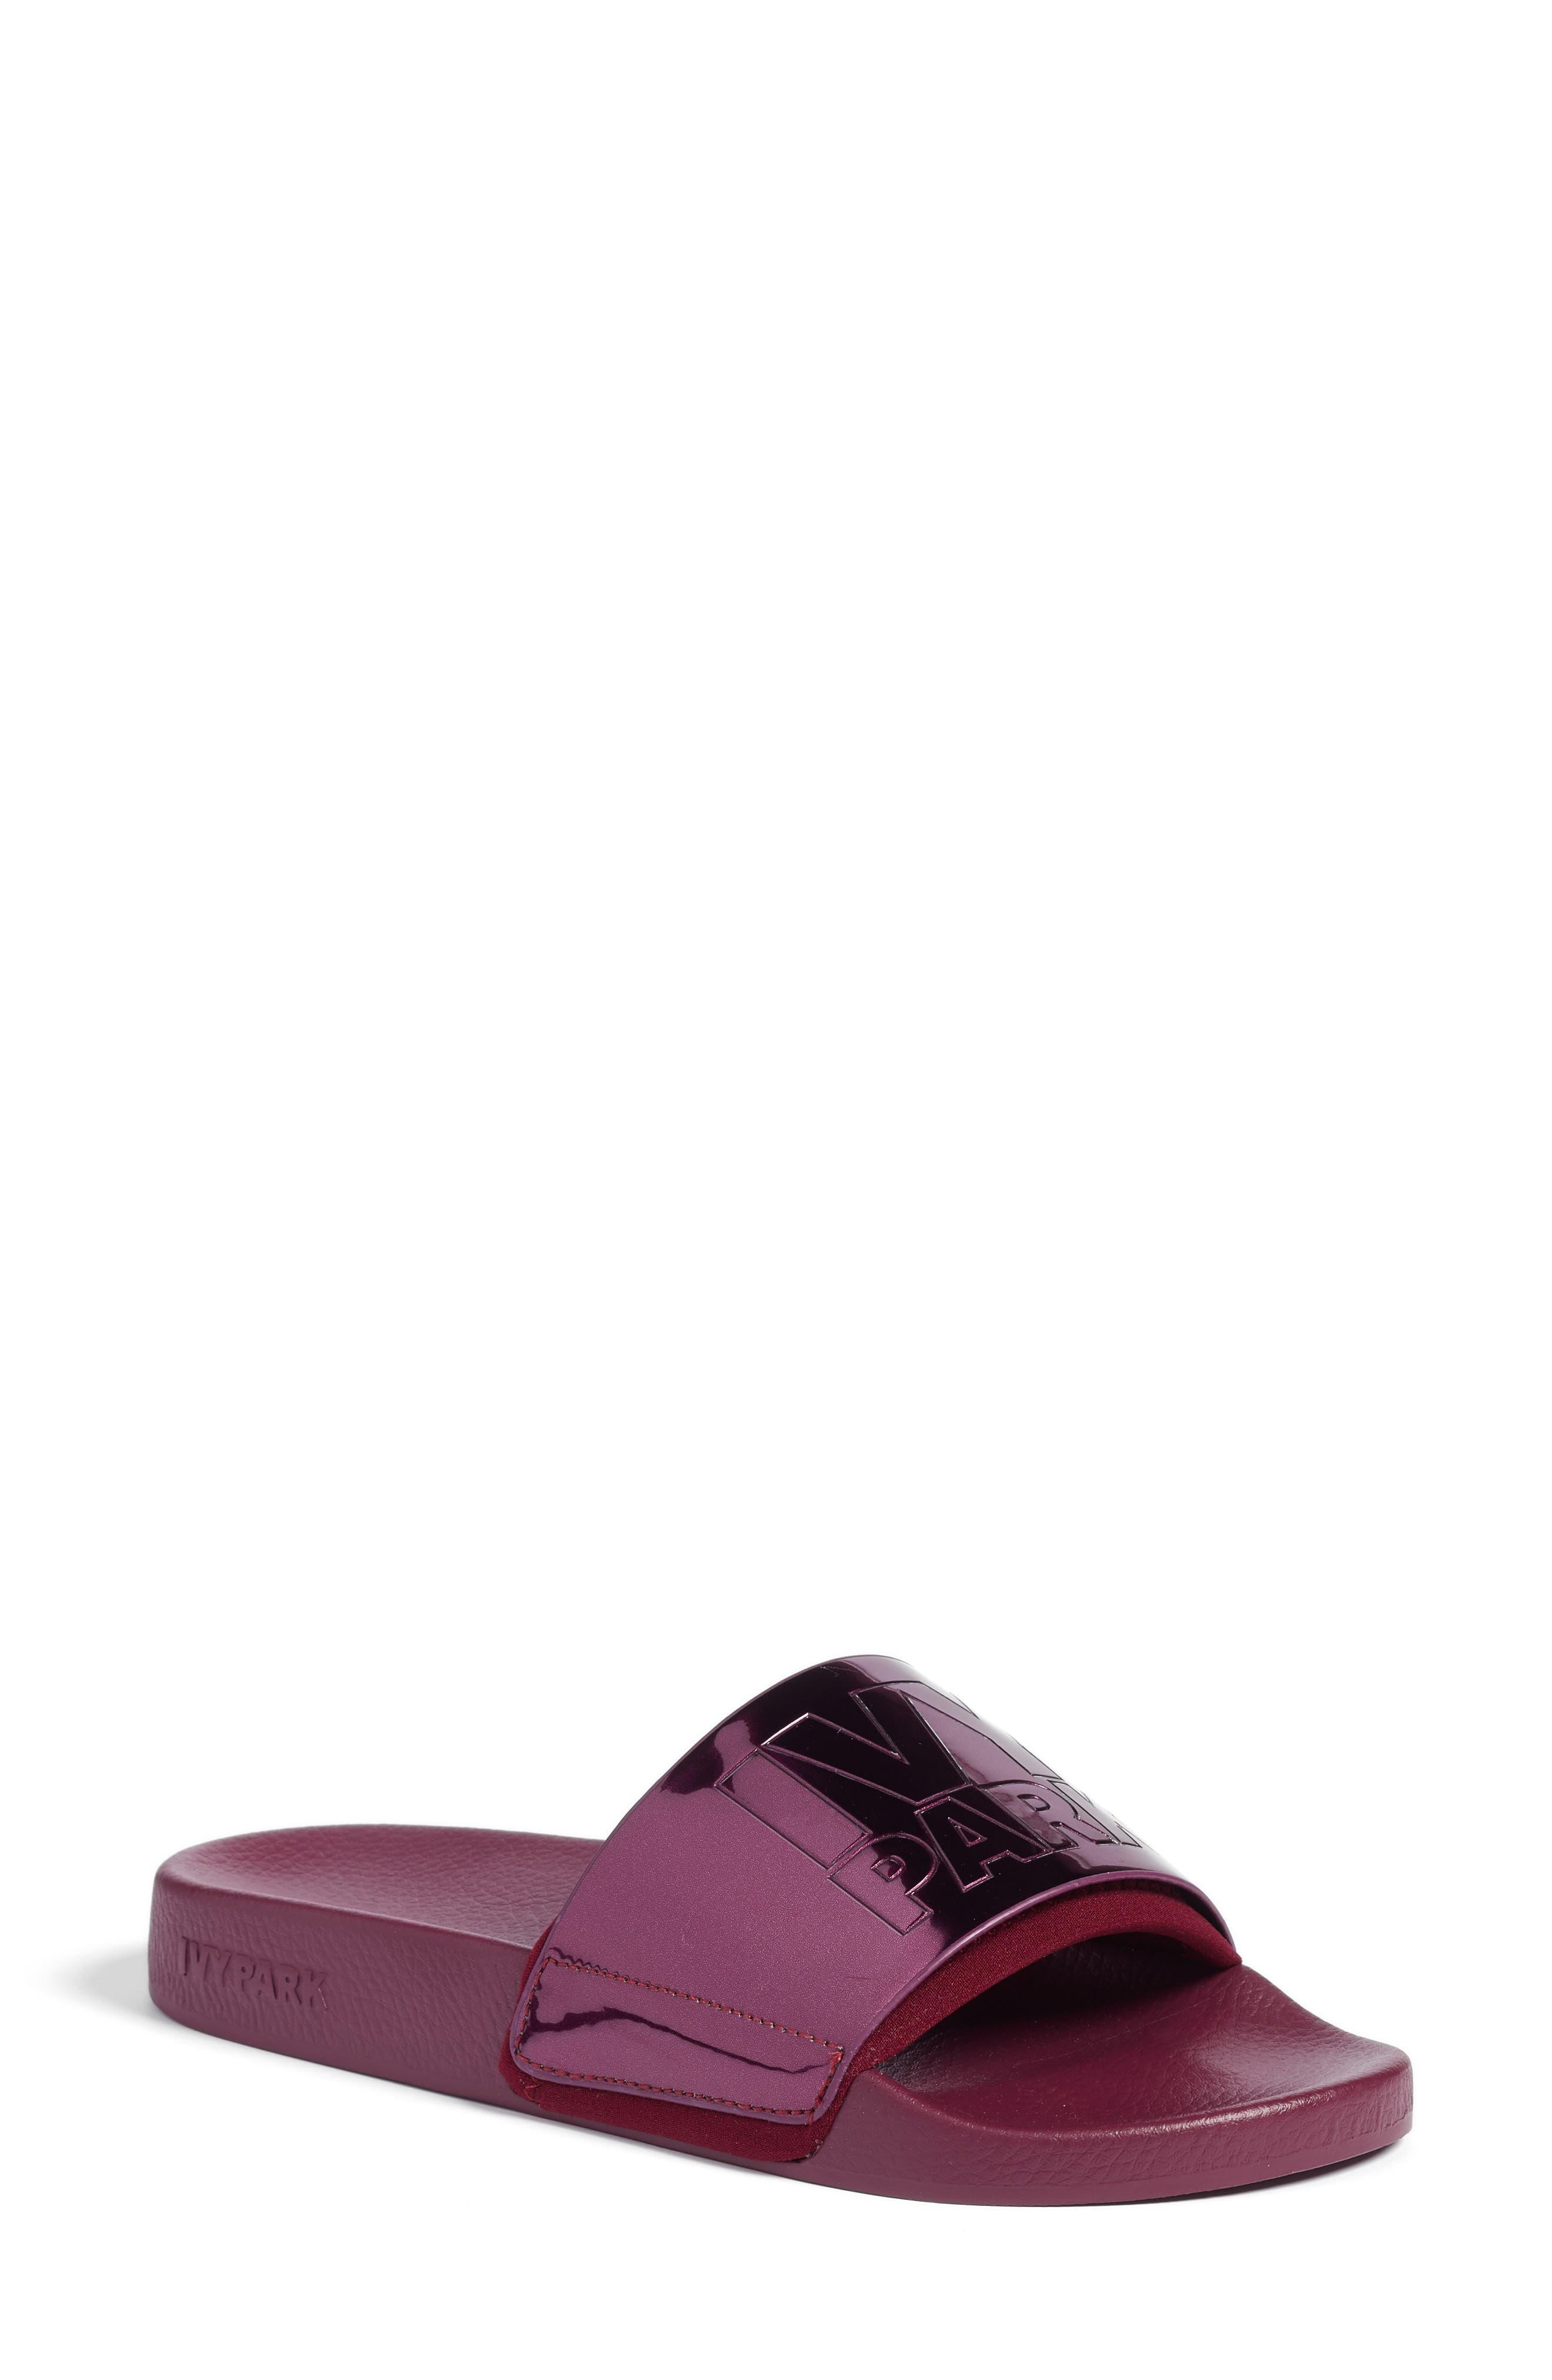 Slide Sandal,                         Main,                         color, Plum